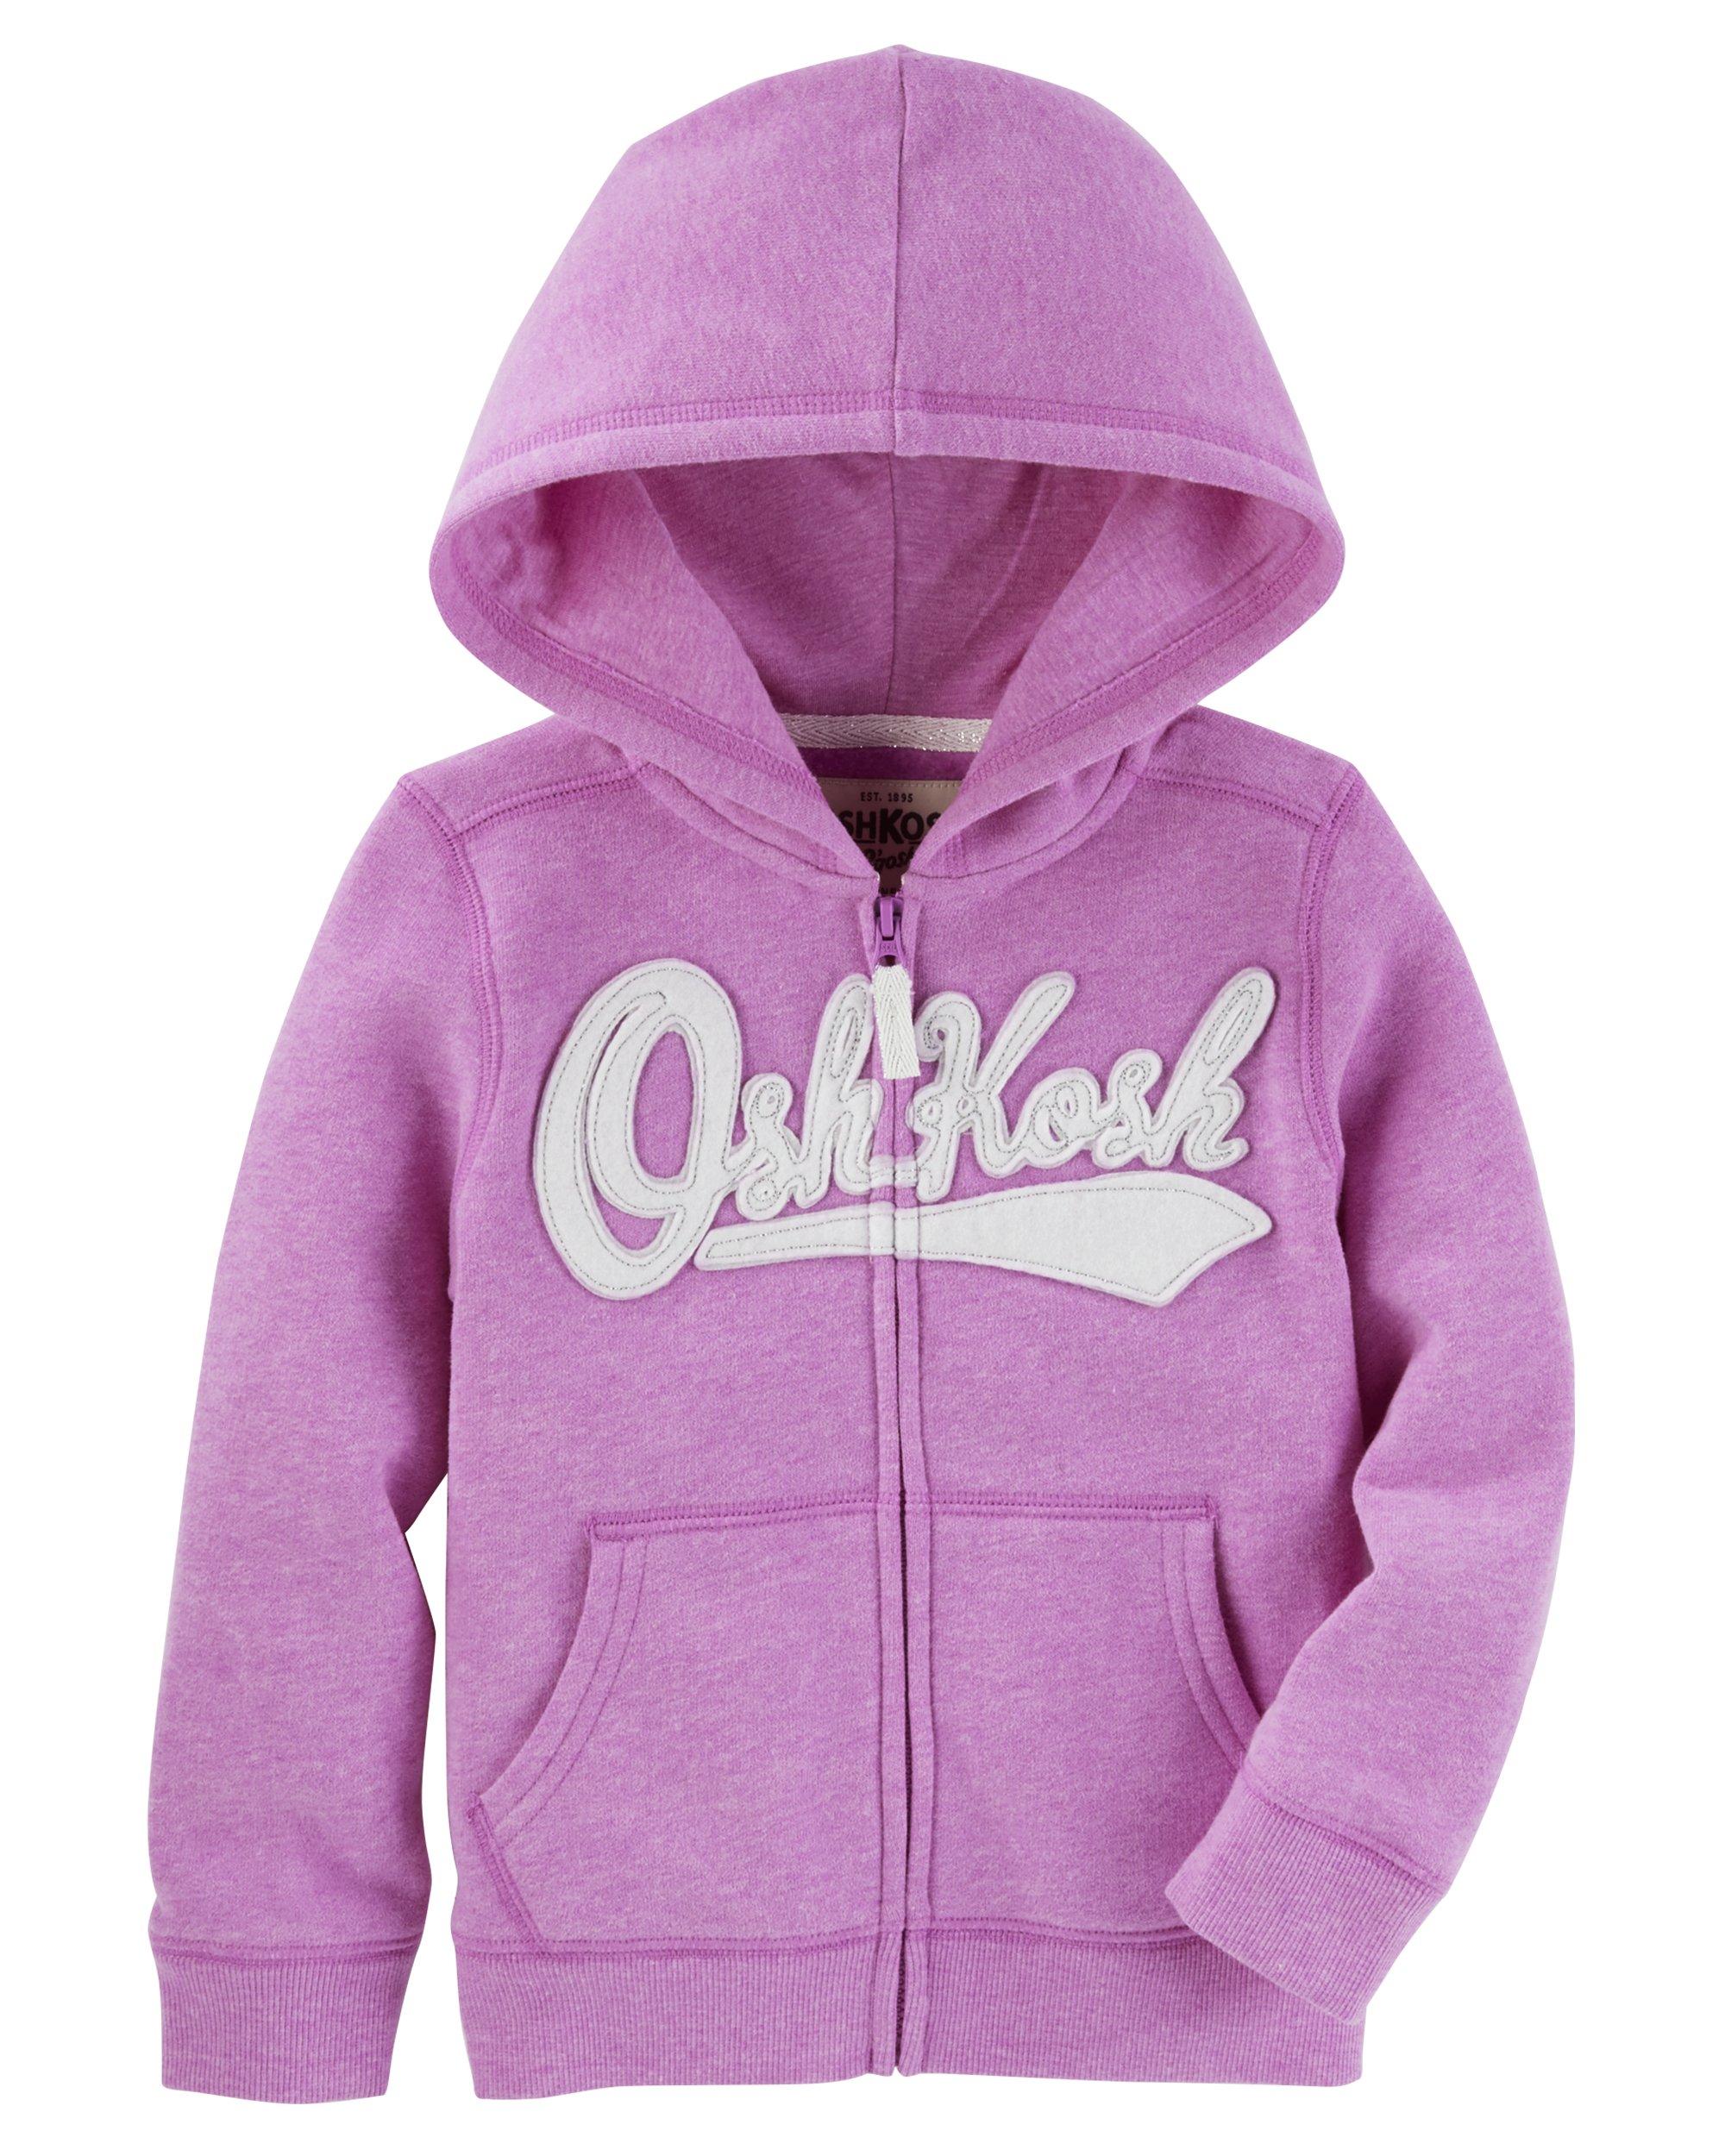 dbebe02166b Best Rated in Girls' Fashion Hoodies & Sweatshirts & Helpful ...